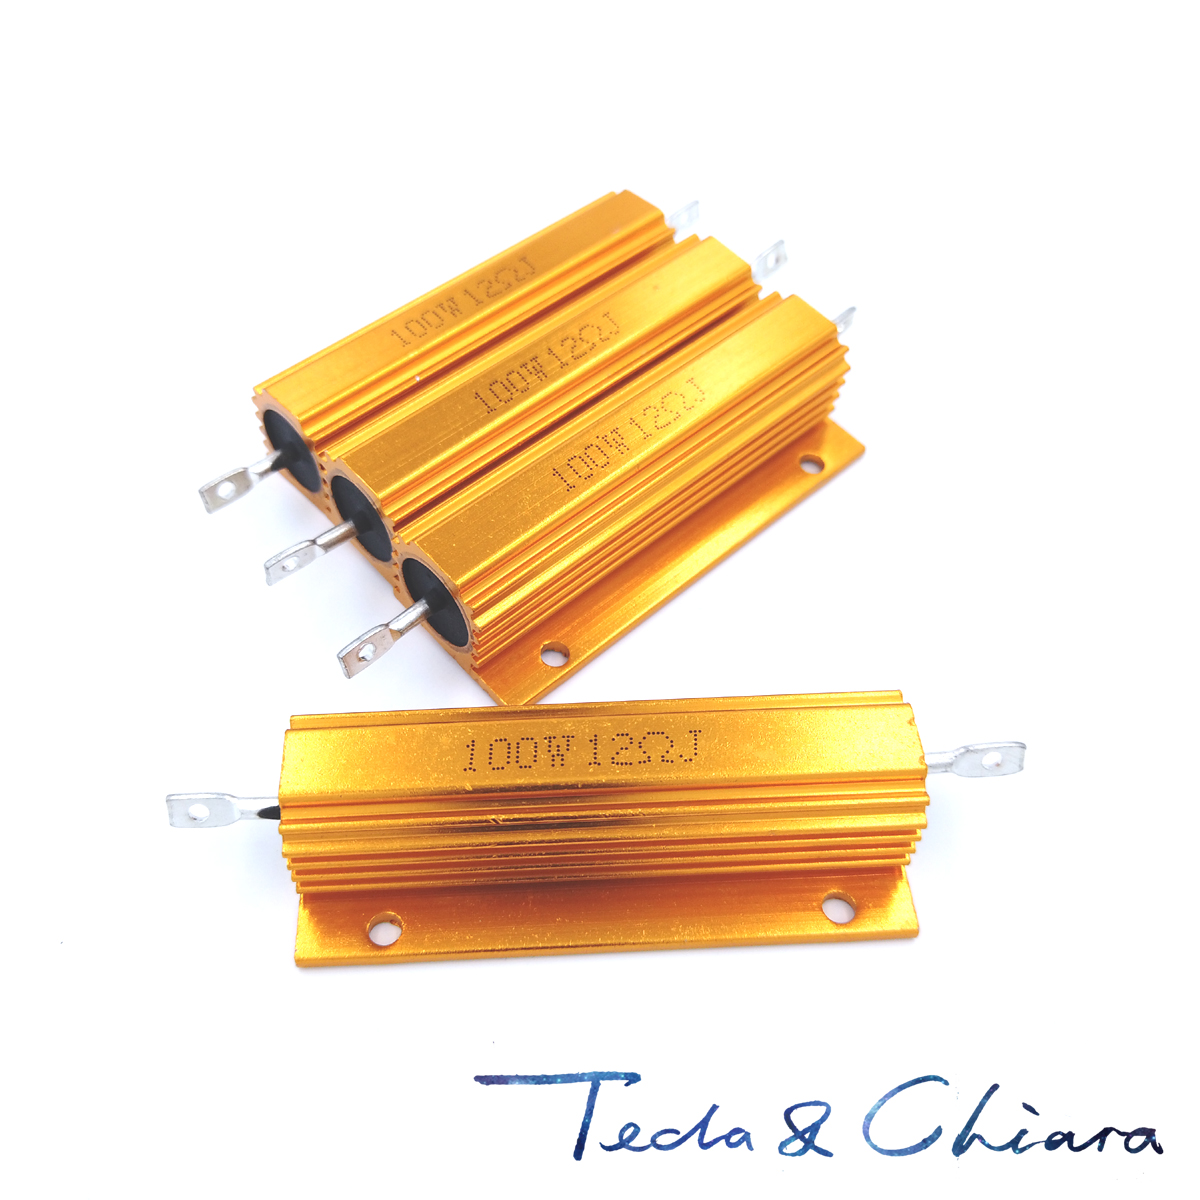 2Pcs 4R 4ohm 4 30R 30ohm 30 R Ohm 100W Watt Aluminum Wirewound Power Metal Shell Case Resistor Resistance RX24